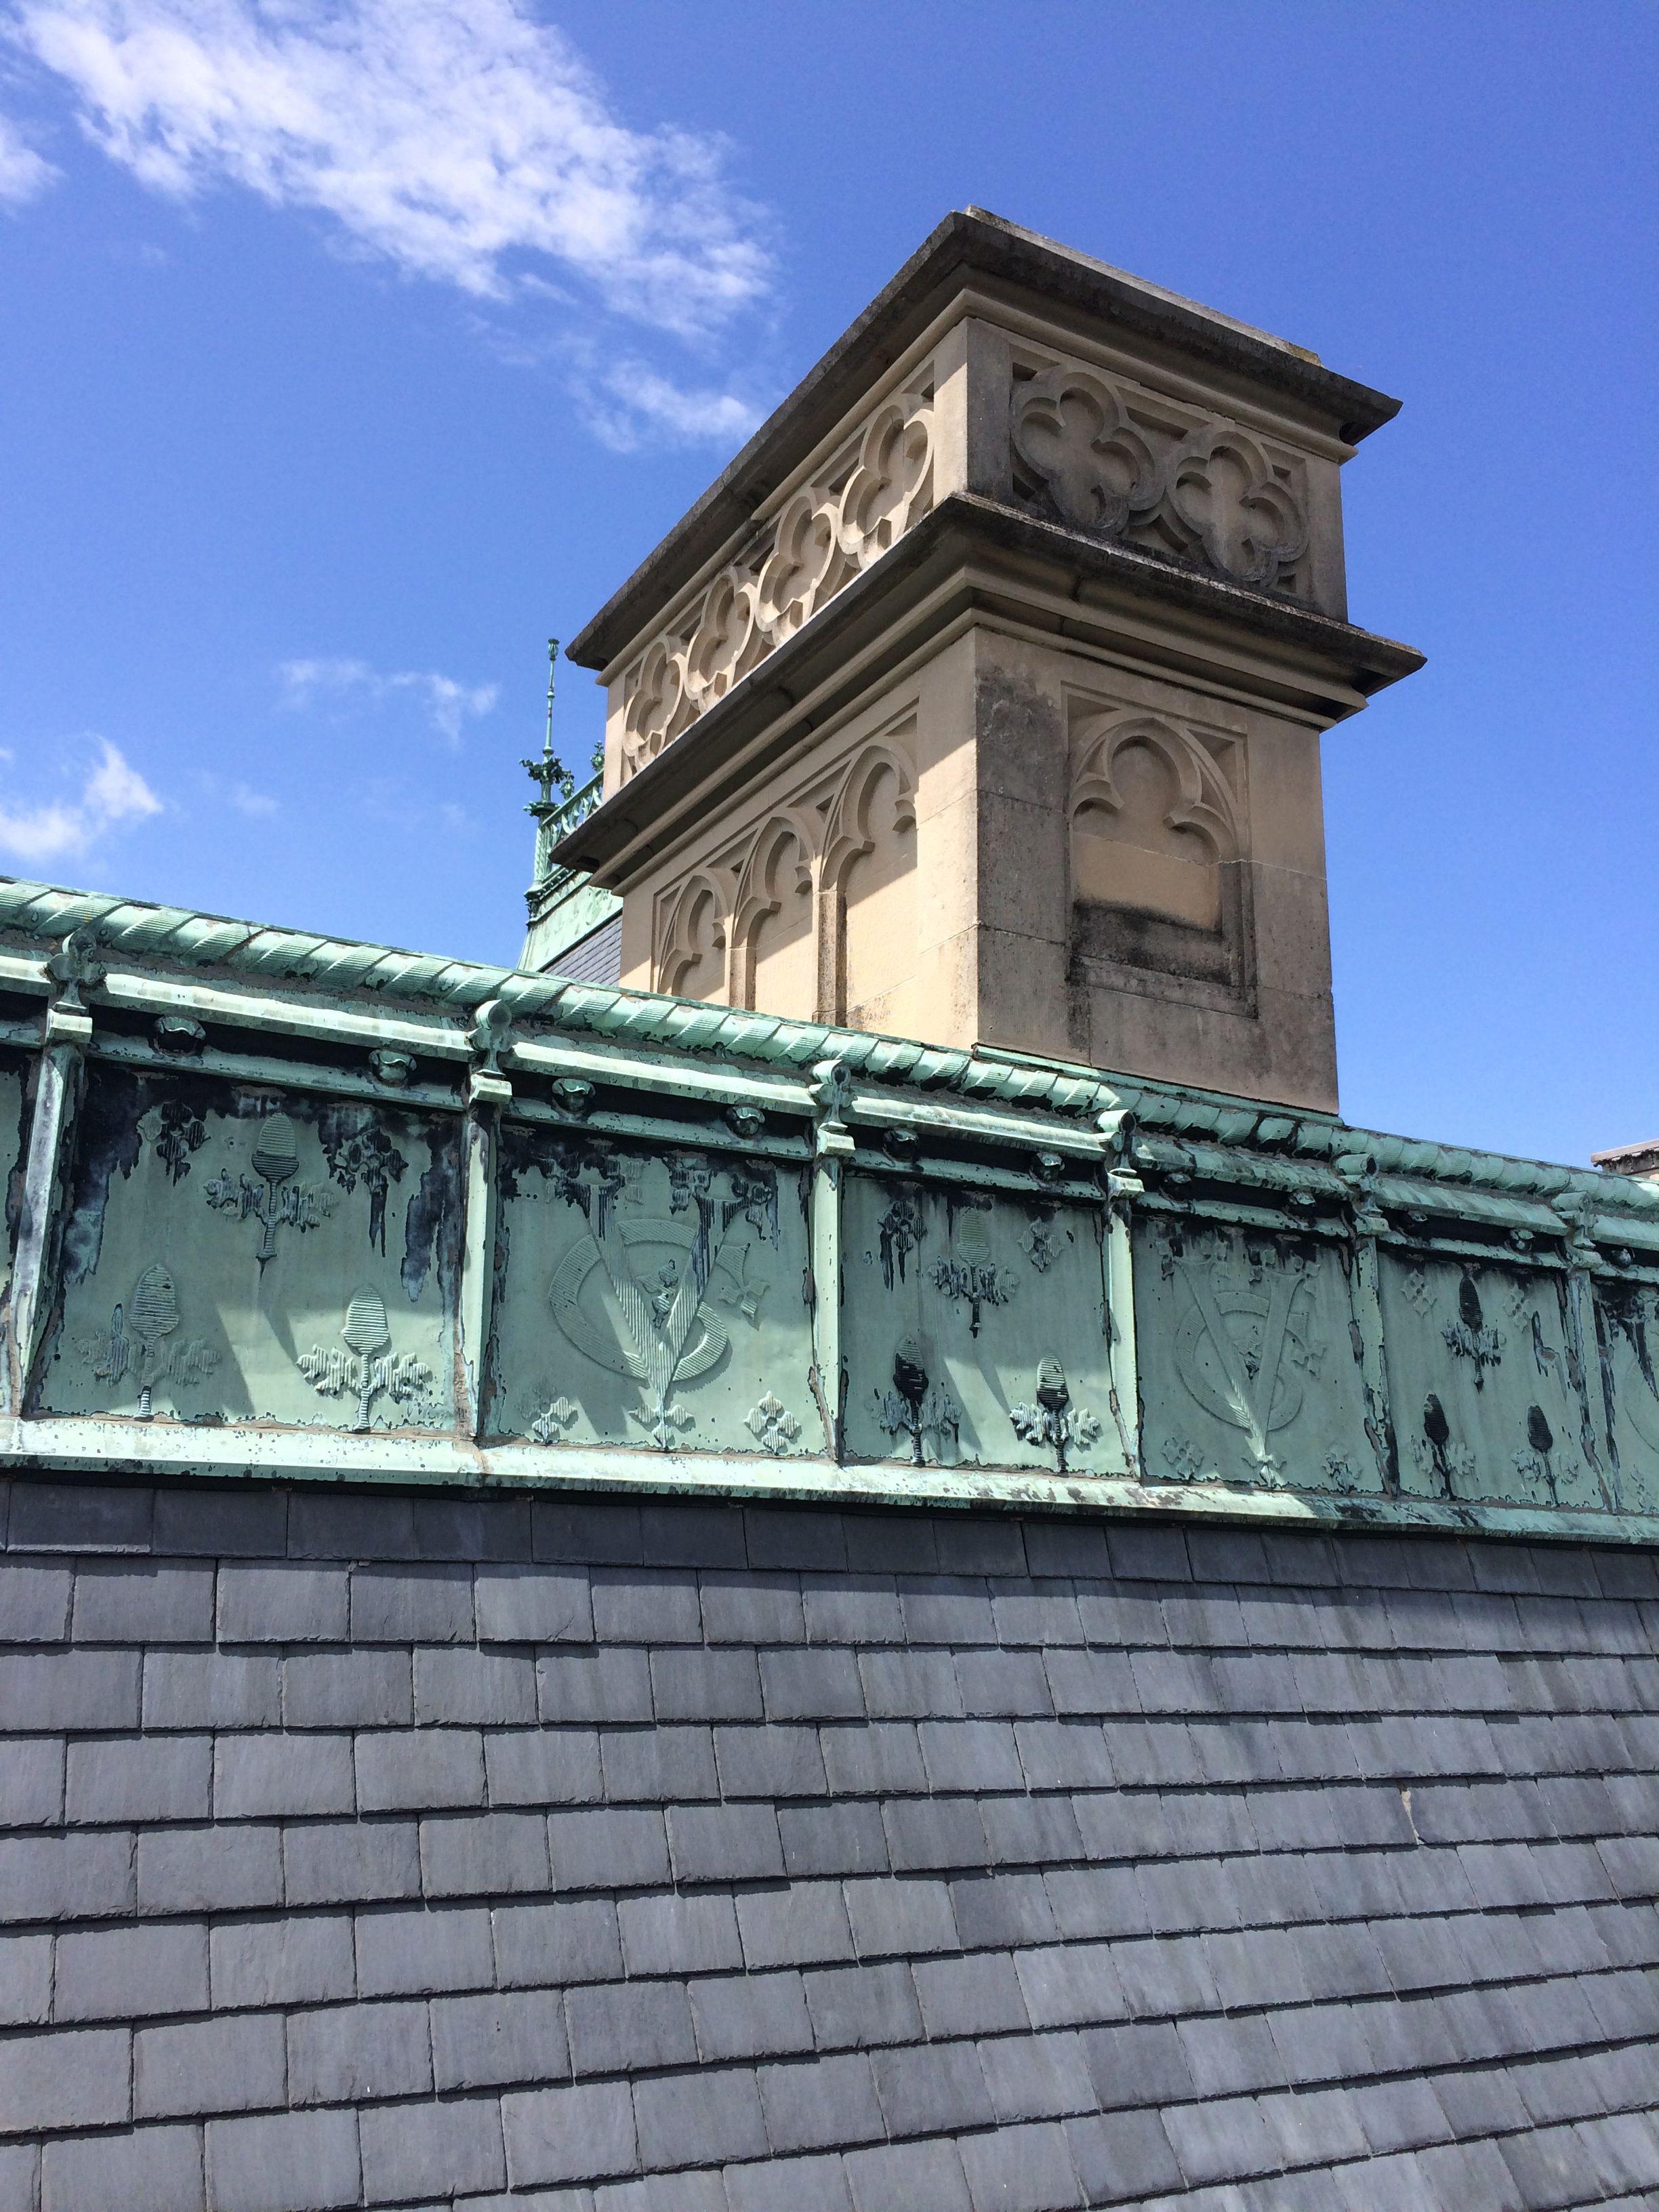 The George Vanderbilt Monogram In The Copper Ridge Piece On The Slate Roof Of The Biltmore Biltmore Estate Biltmore House Biltmore